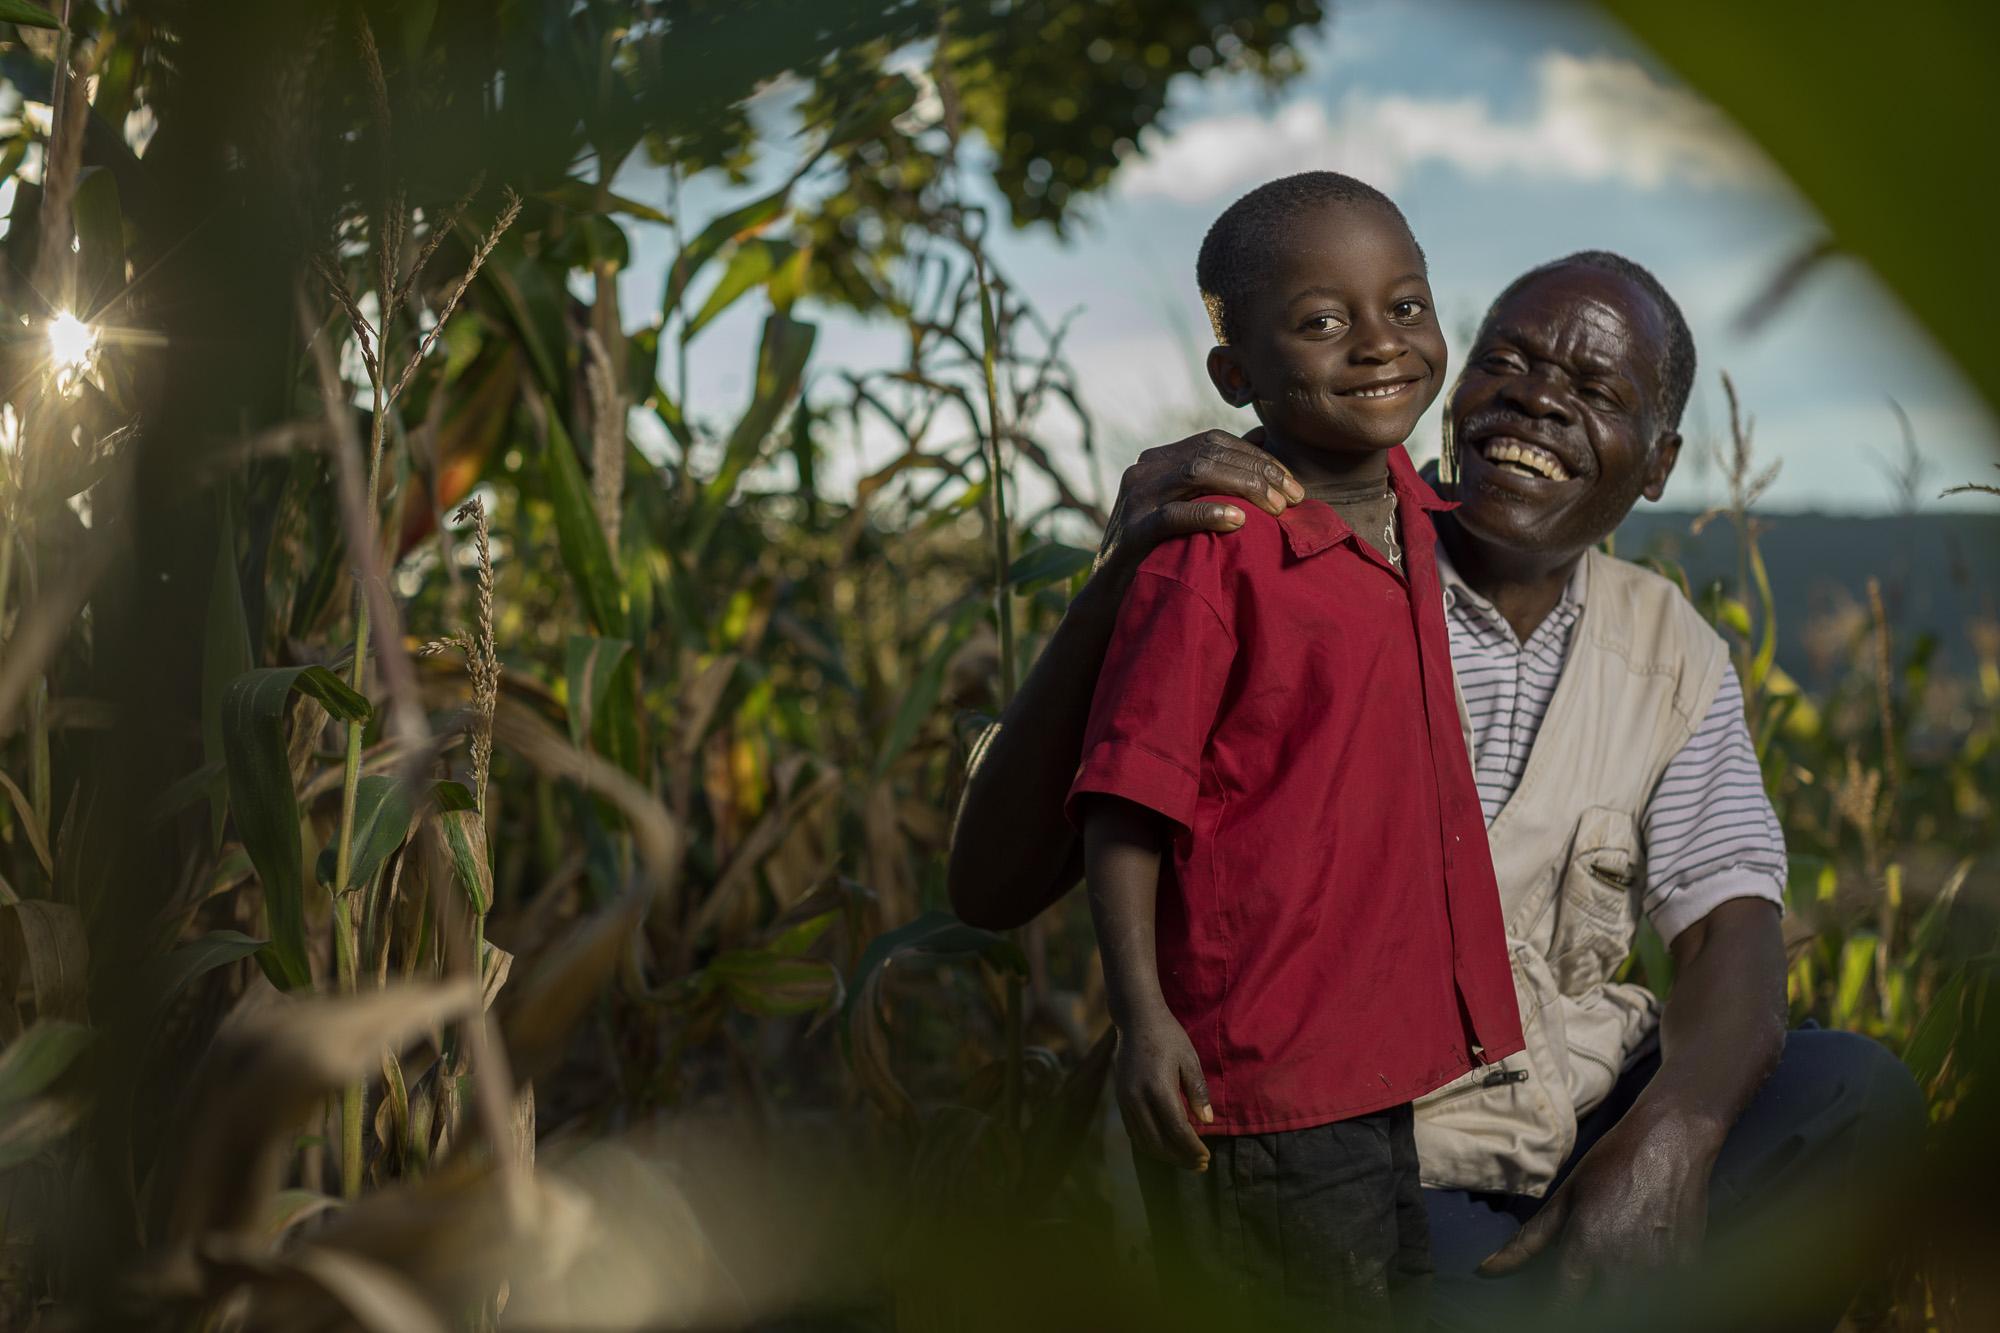 Malawian farmer Daniel Mhoni, 68, with his grandson